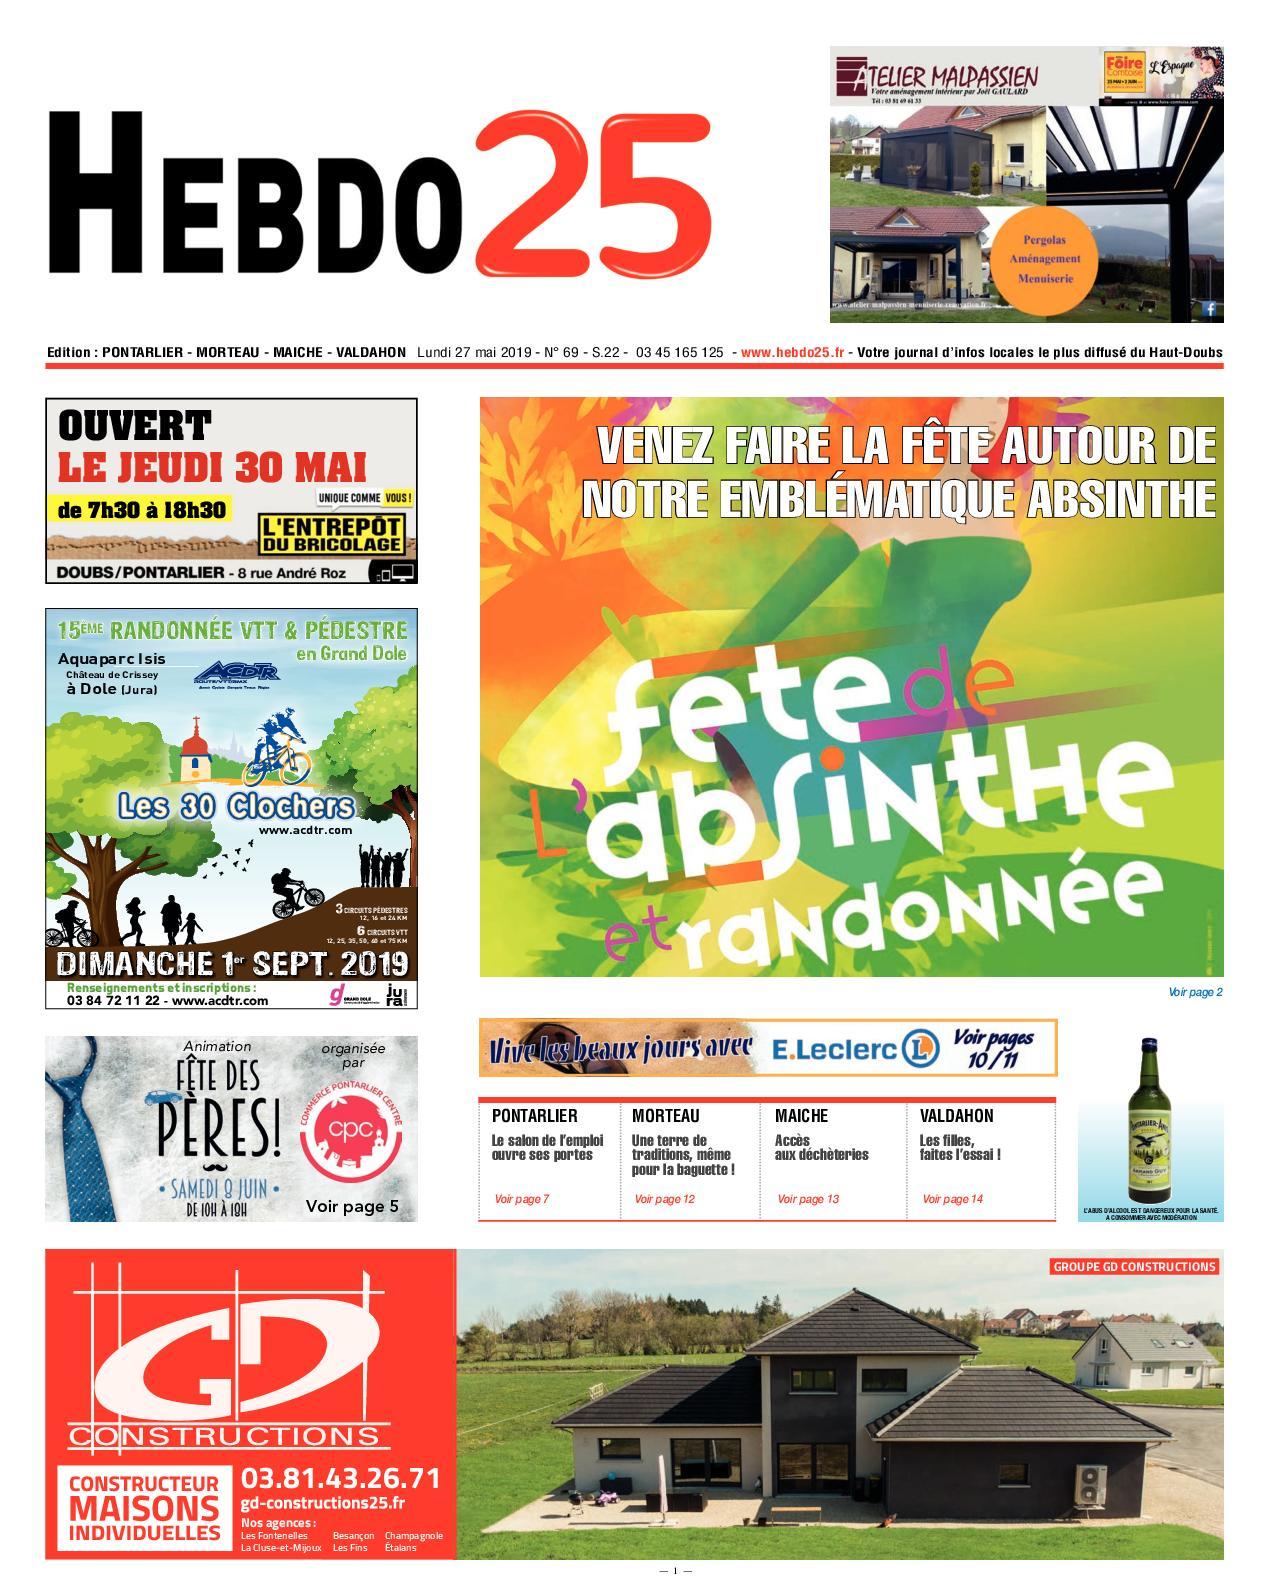 Canapé De Jardin Bois Inspirant Calaméo Hebdo Pontarlier 2019 Semaine 22 Of 38 Beau Canapé De Jardin Bois